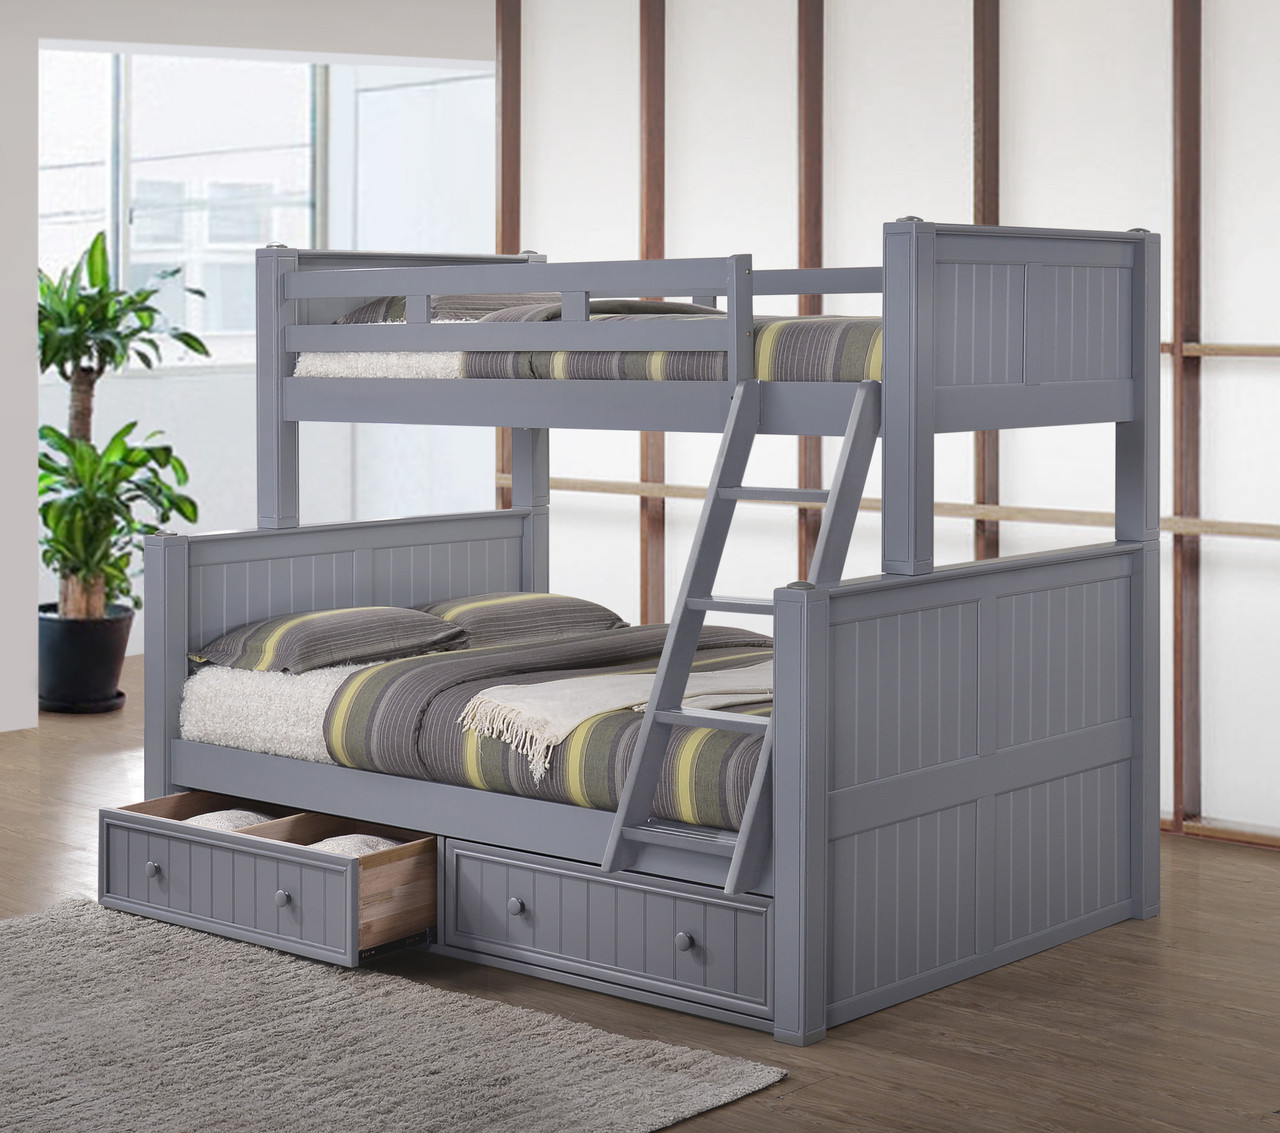 Dillon Black Twin Full Bunk Bed Convertible Bunk Beds